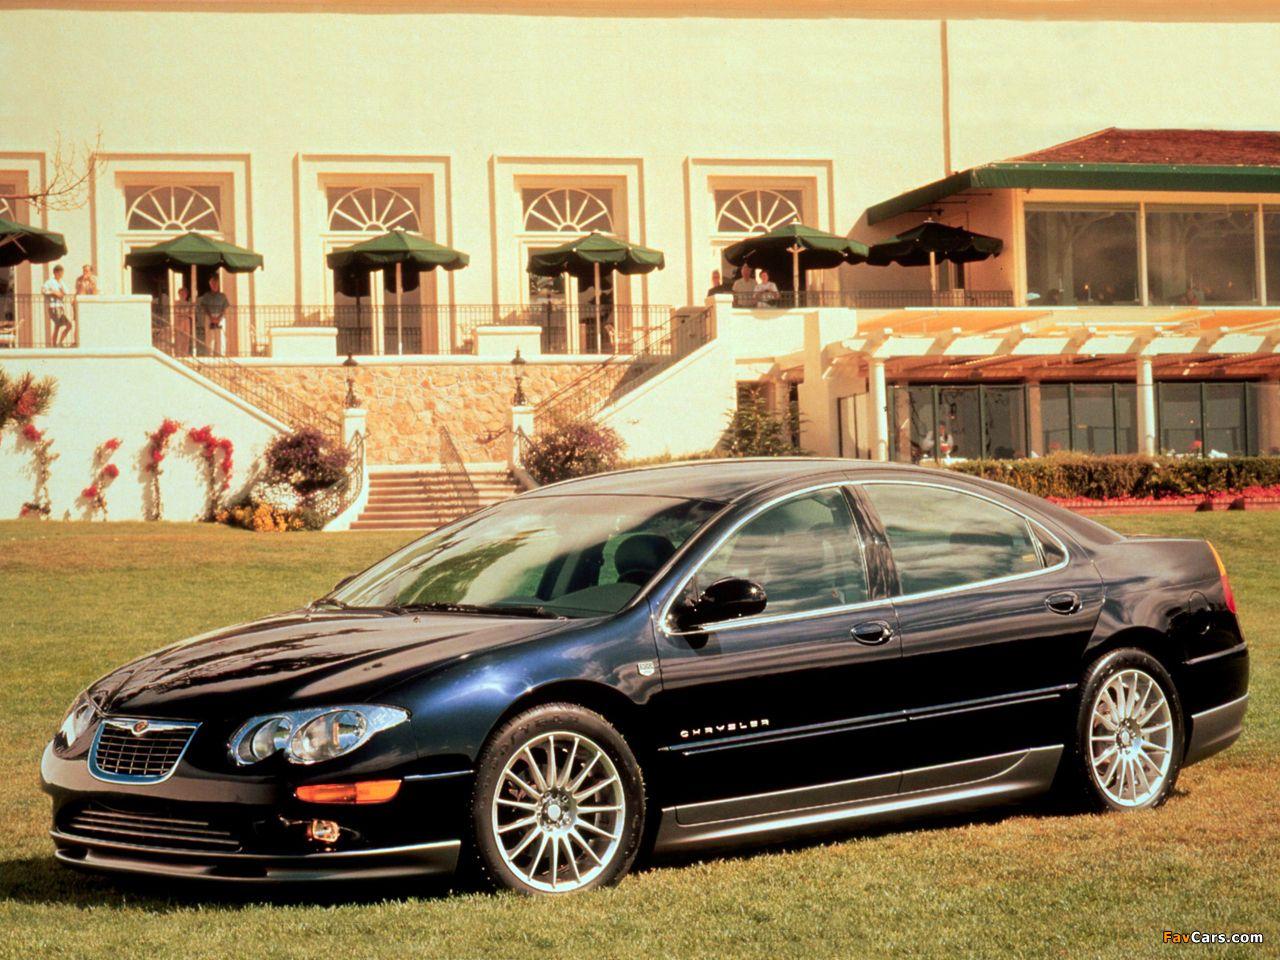 2002 Chrysler 300m Special Chrysler 300m Chrysler Bmw